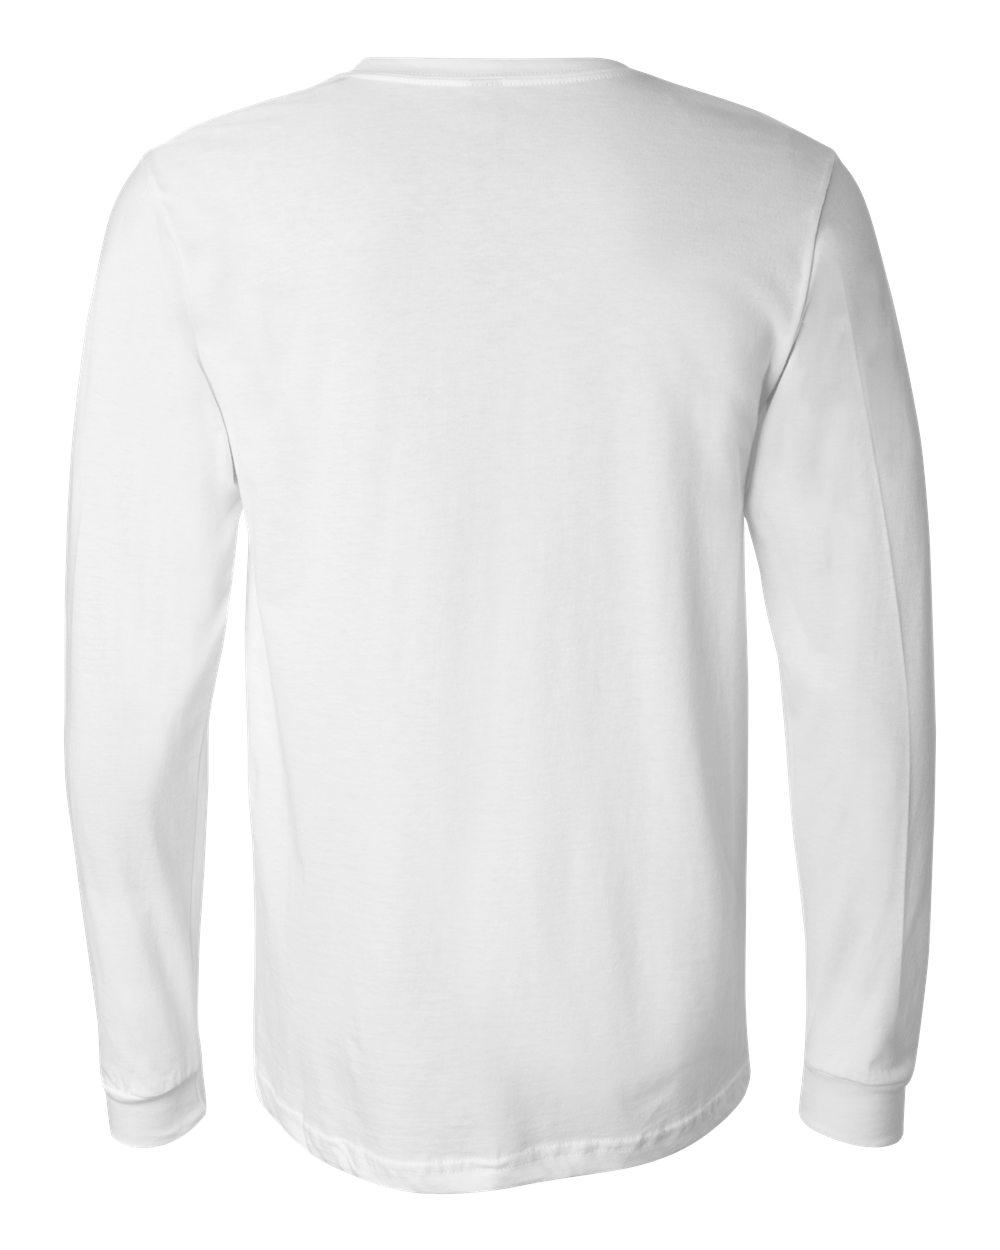 Bella-Canvas-Mens-Blank-Top-Long-Sleeve-Jersey-Tee-T-Shirt-3501-up-to-3XL thumbnail 117